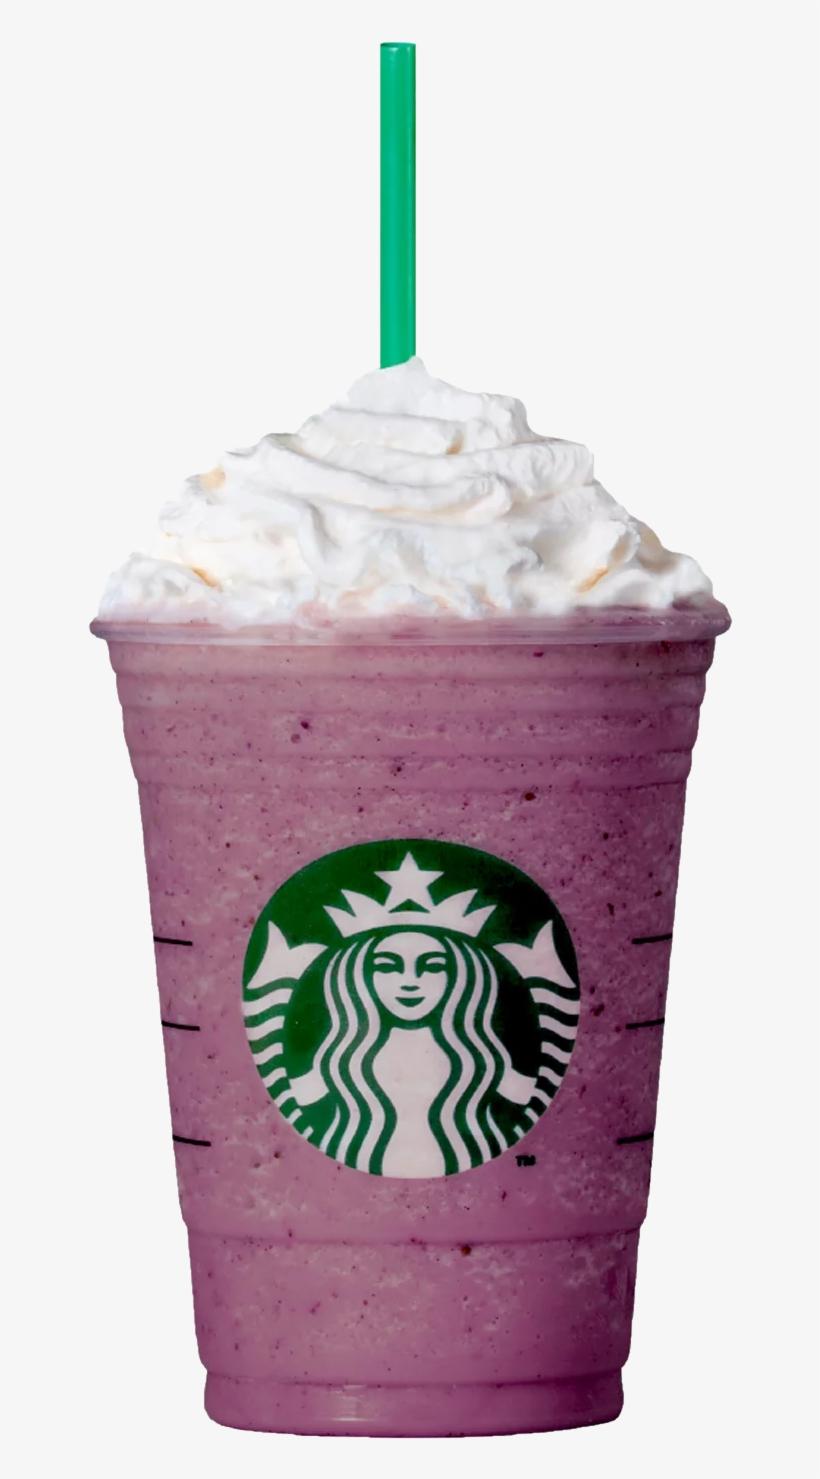 Starbucks New Halloween Drink 2018, transparent png #5745860